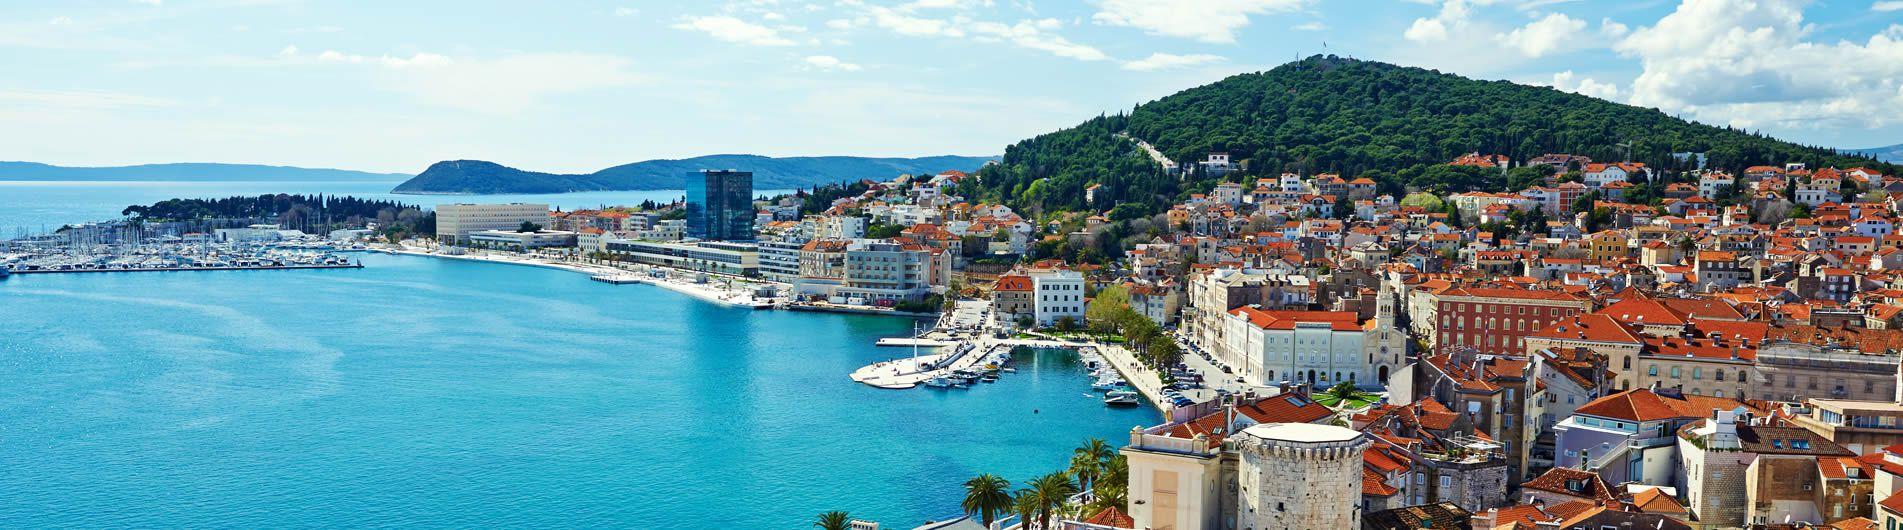 Tour of Split, Croatia